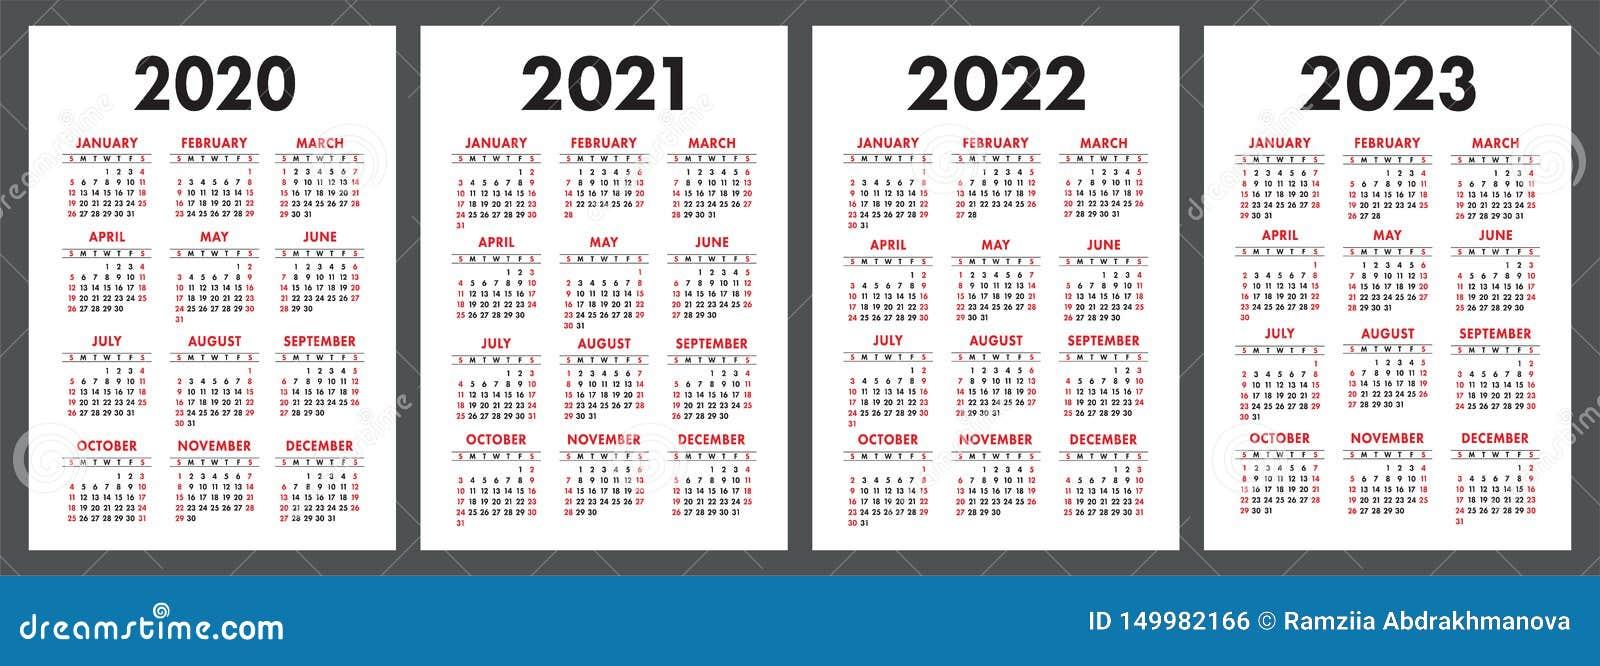 2022 Pocket Calendar Printable.Calendar 2020 2021 2022 And 2023 English Color Vector Set Vertical Wall Or Pocket Calender Template Design Collection Stock Vector Illustration Of Template Year 149982166